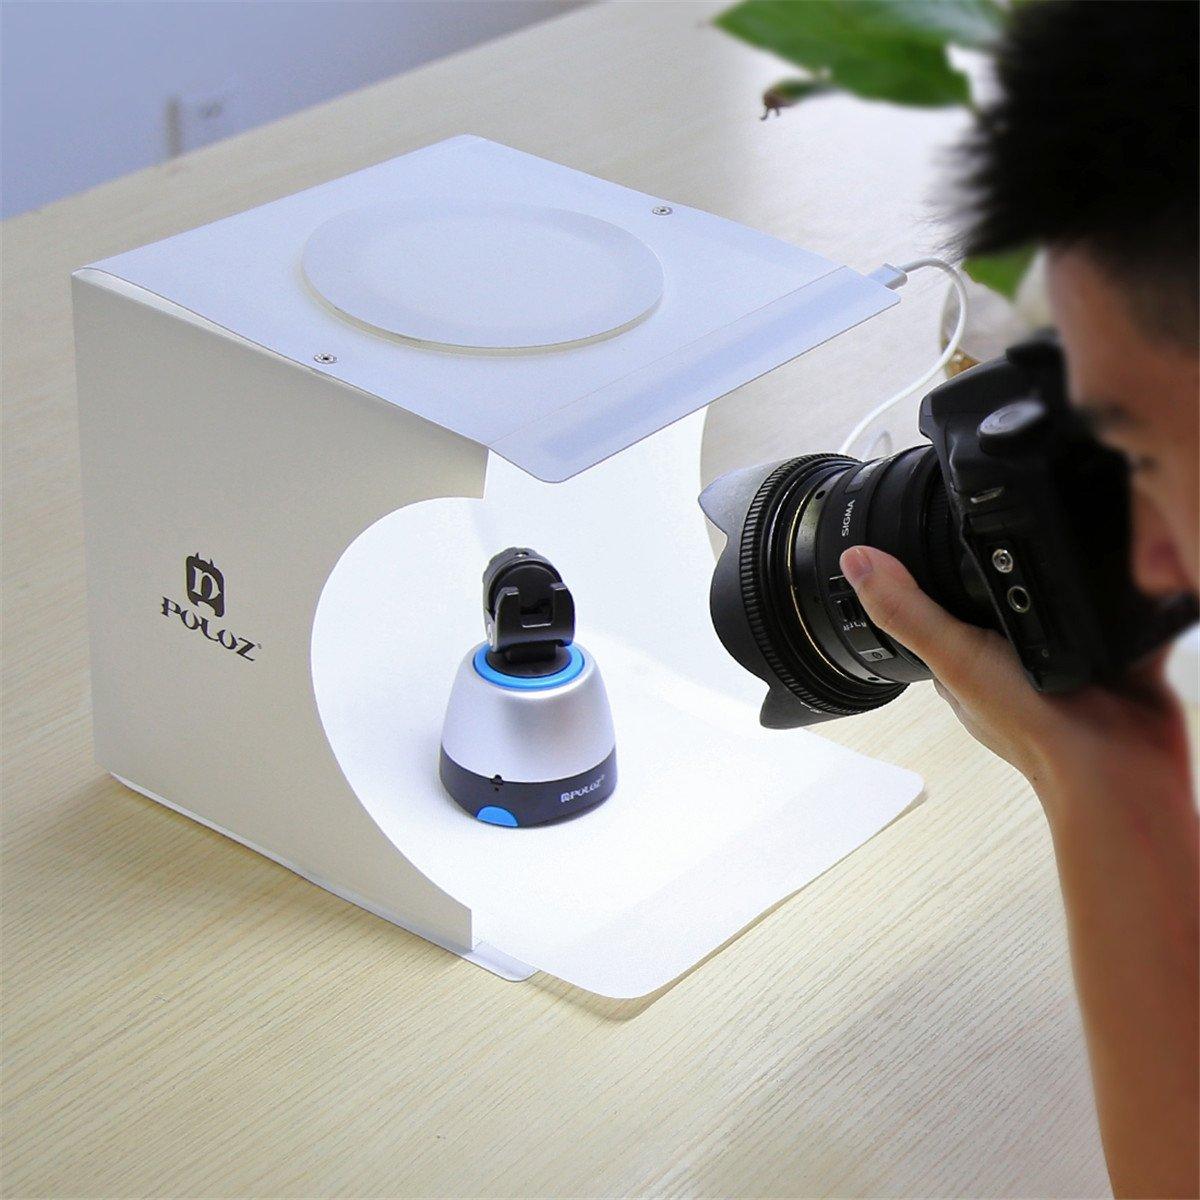 20/x 20/cm Ledmomo photo studio tenda sfondo studio fotografico ripresa tenda piccola scatola chiara pieghevole portatile con 6/colori